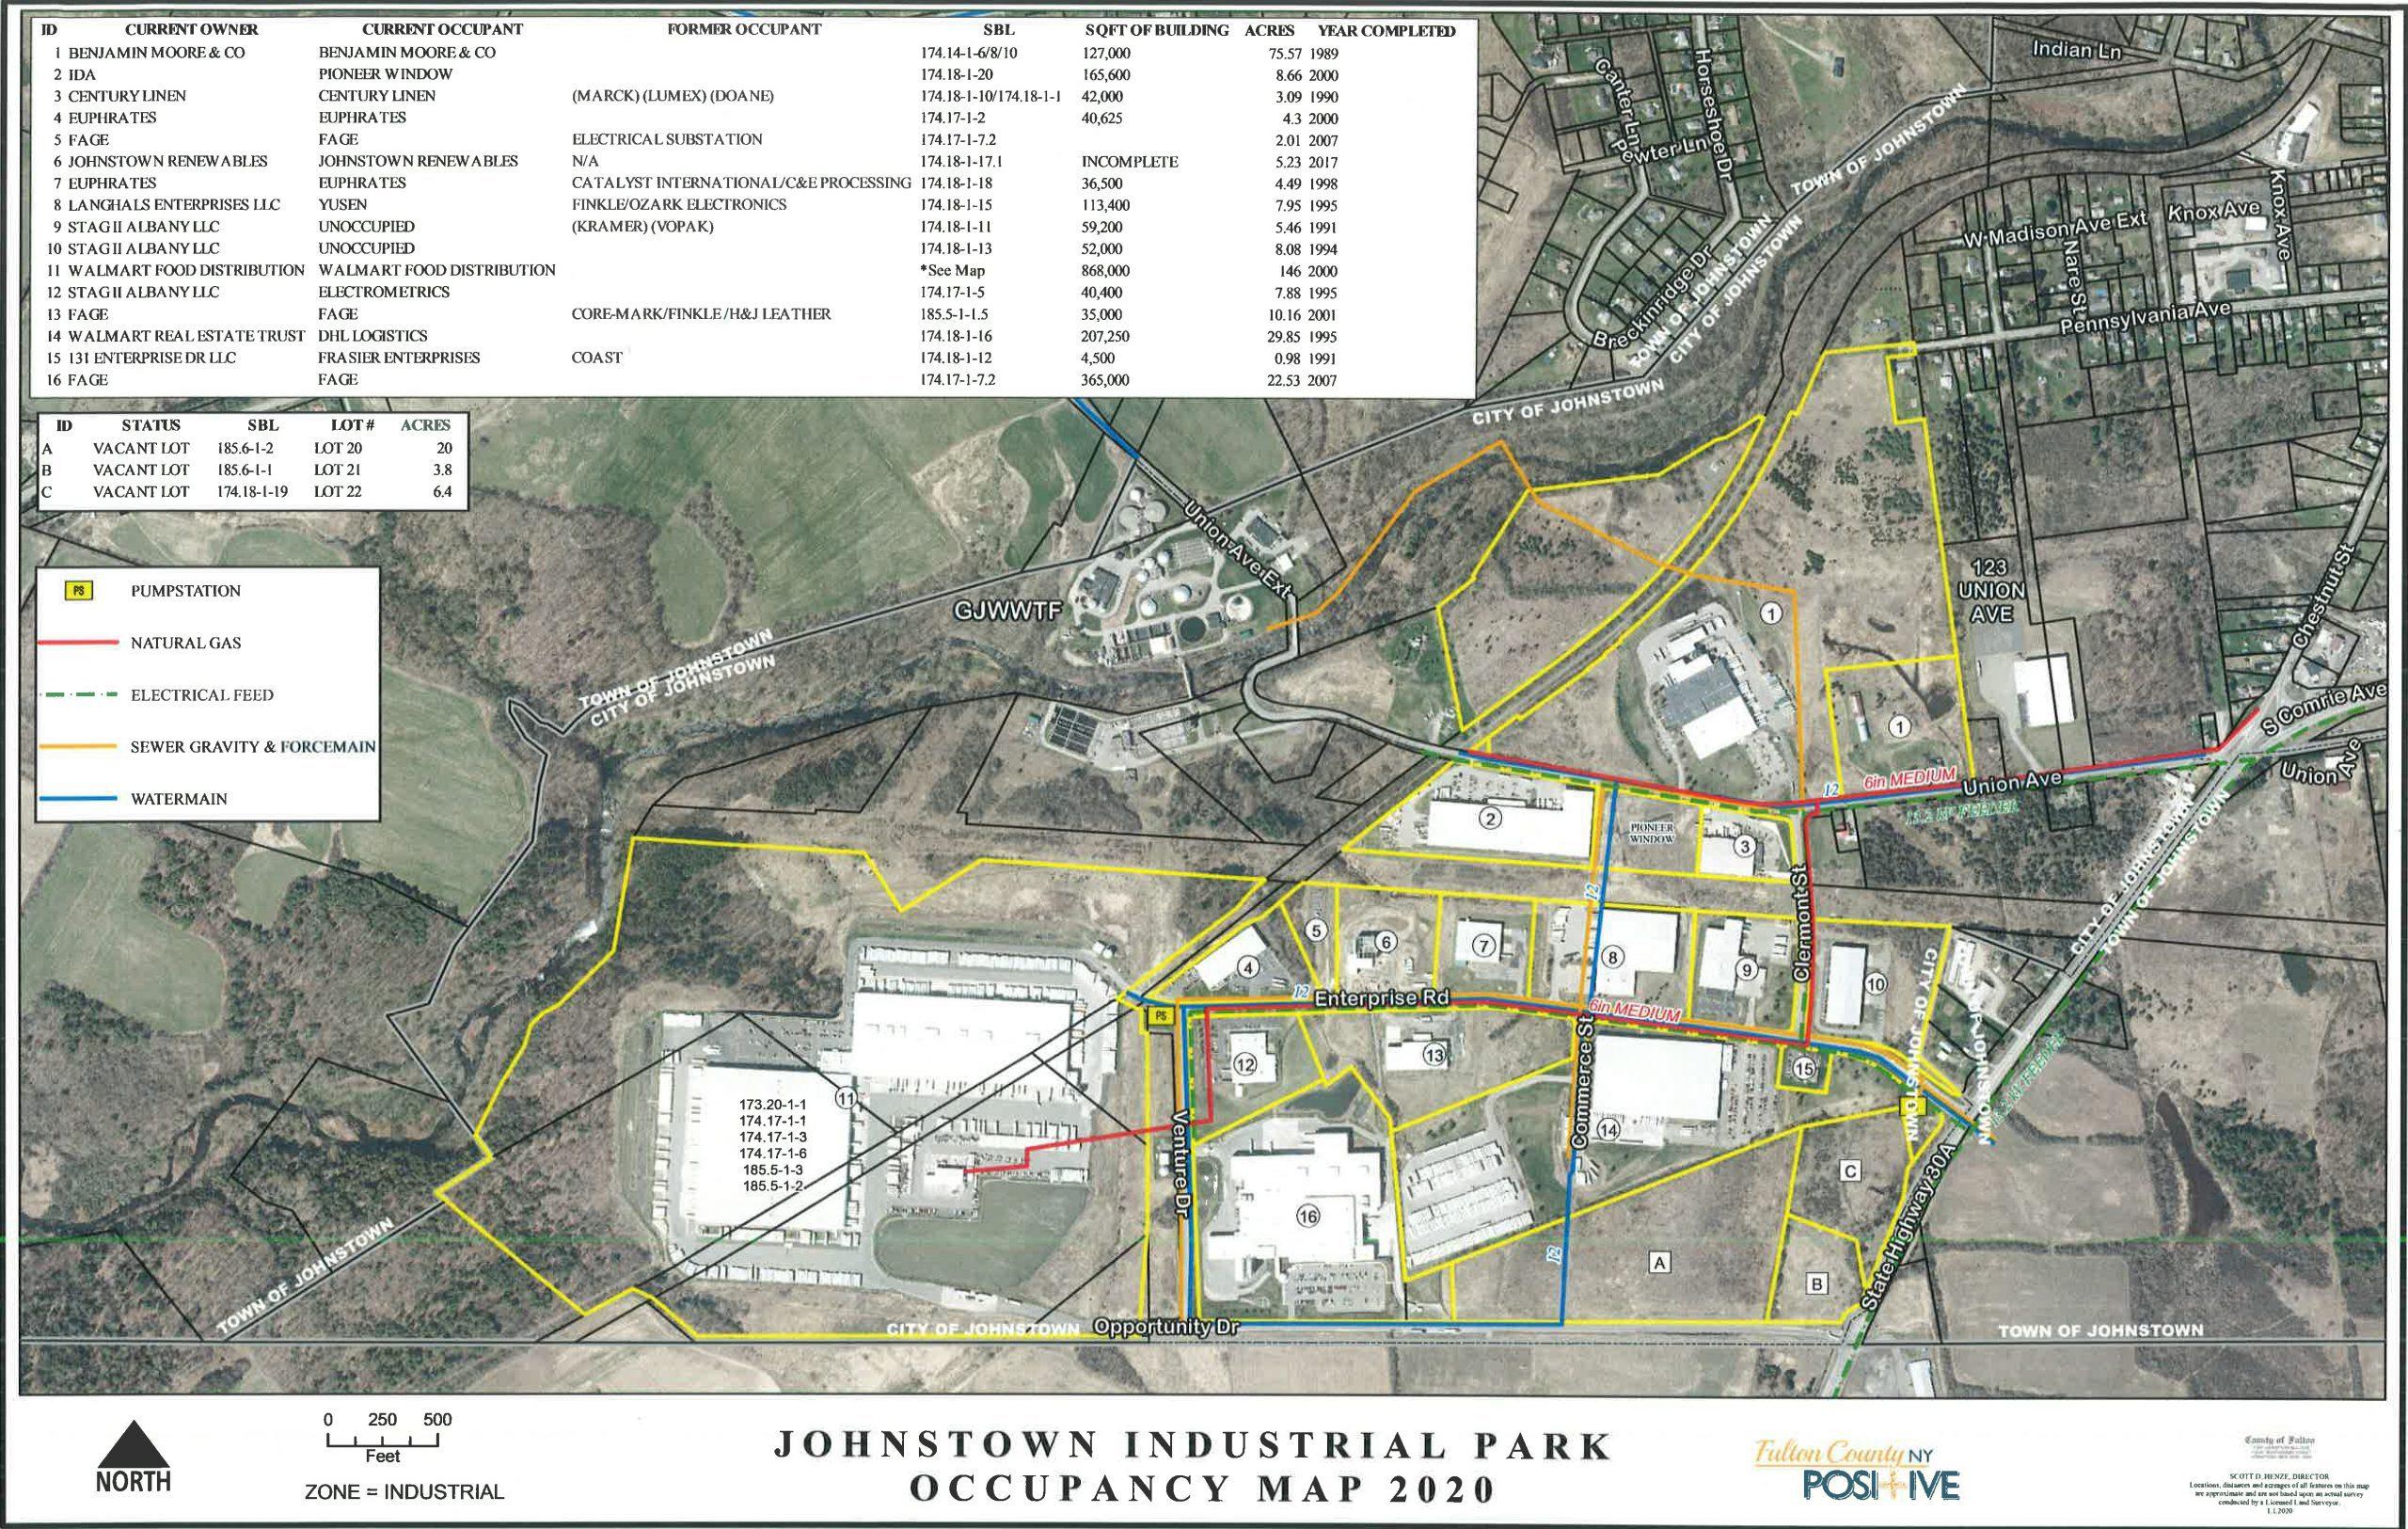 Johnstown Industrial Park